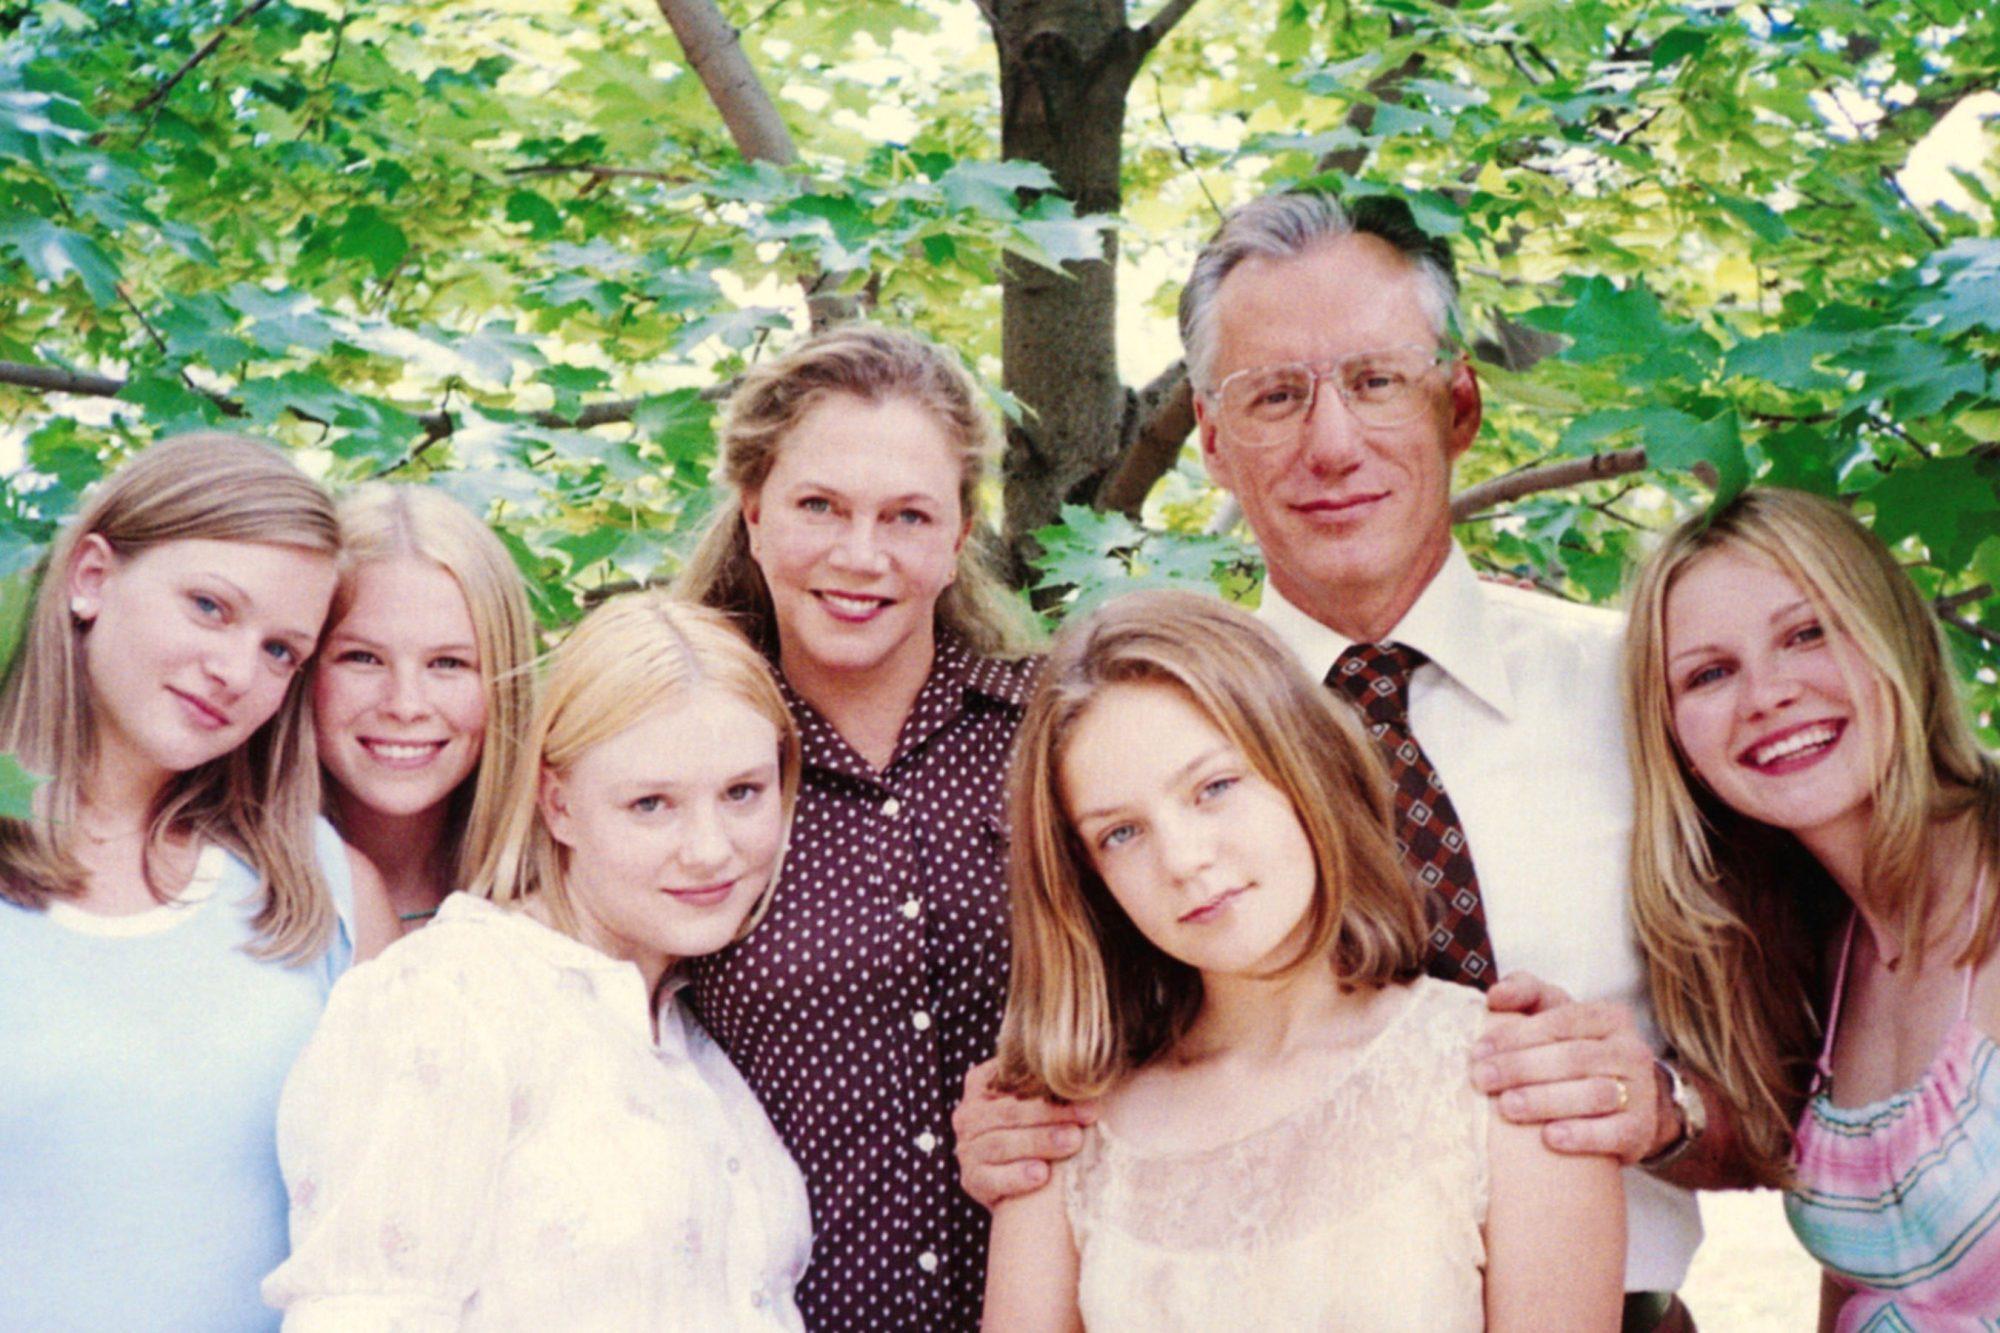 THE VIRGIN SUICIDES, from left: Hanna Hall, Leslie Hayman, Chelse Swain, Kathleen Turner, A.J. Cook,